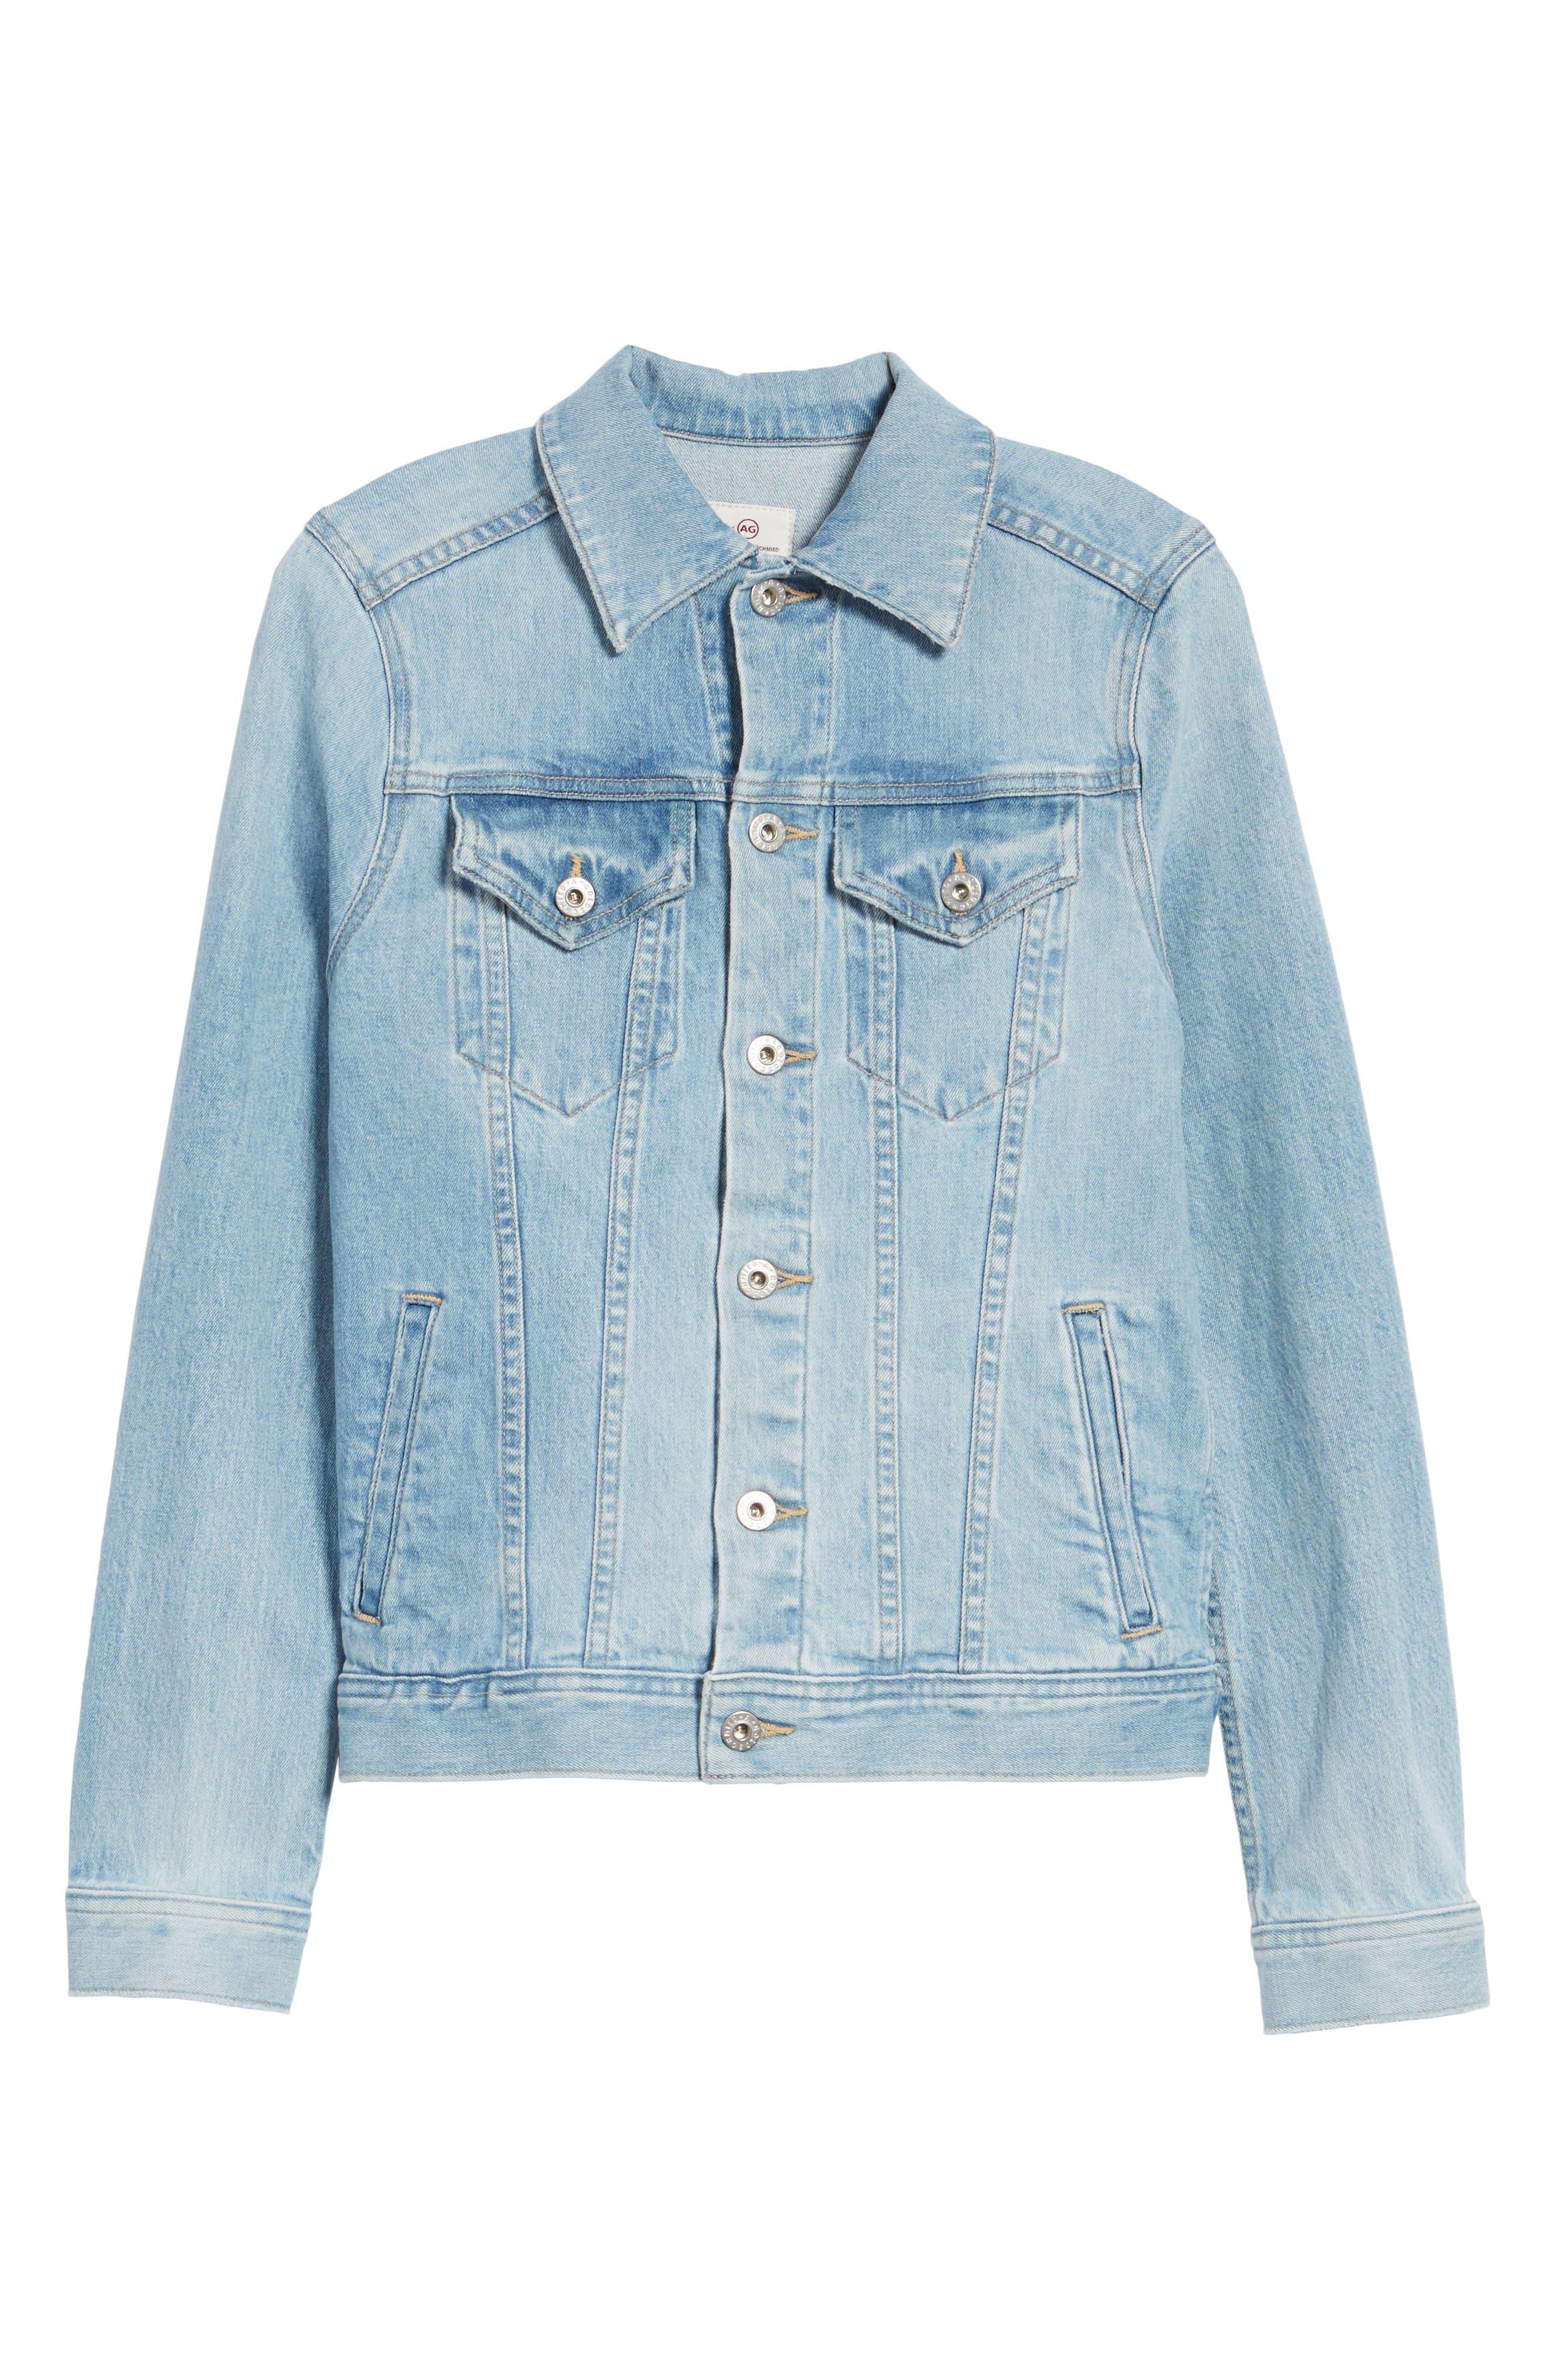 Mya Denim Jacket,                             Alternate thumbnail 6, color,                             Sunlight Blue